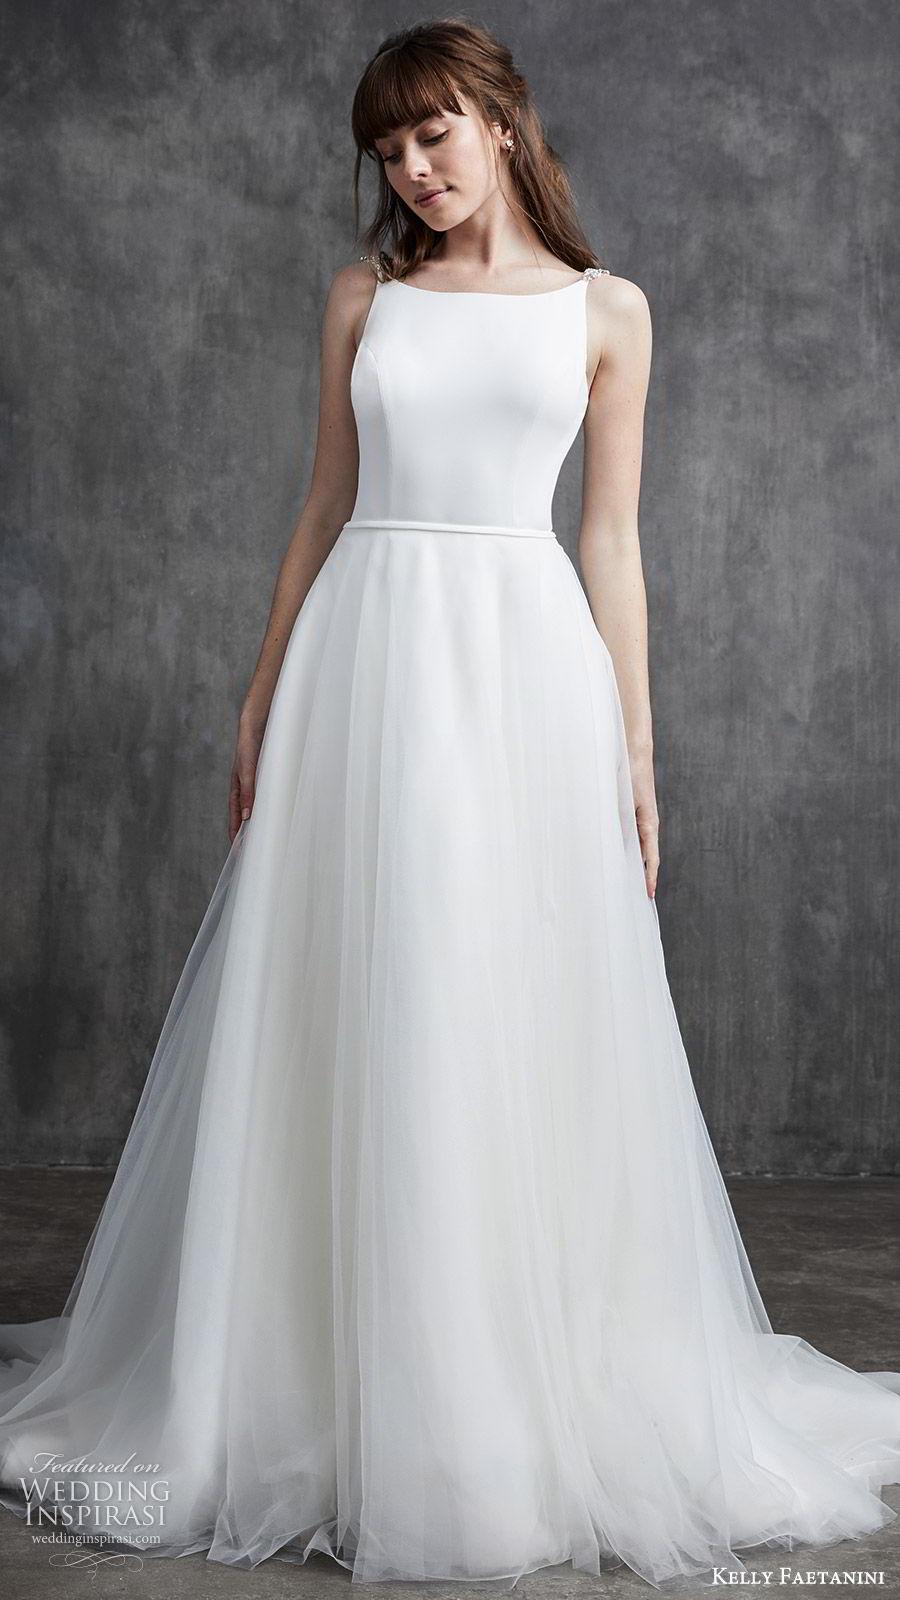 kelly faetanini spring 2020 bridal sleeveless beaded straps bateau neckline sheath wedding dress (10) ball gown overskirt low open back chapel train clean minimalist mv